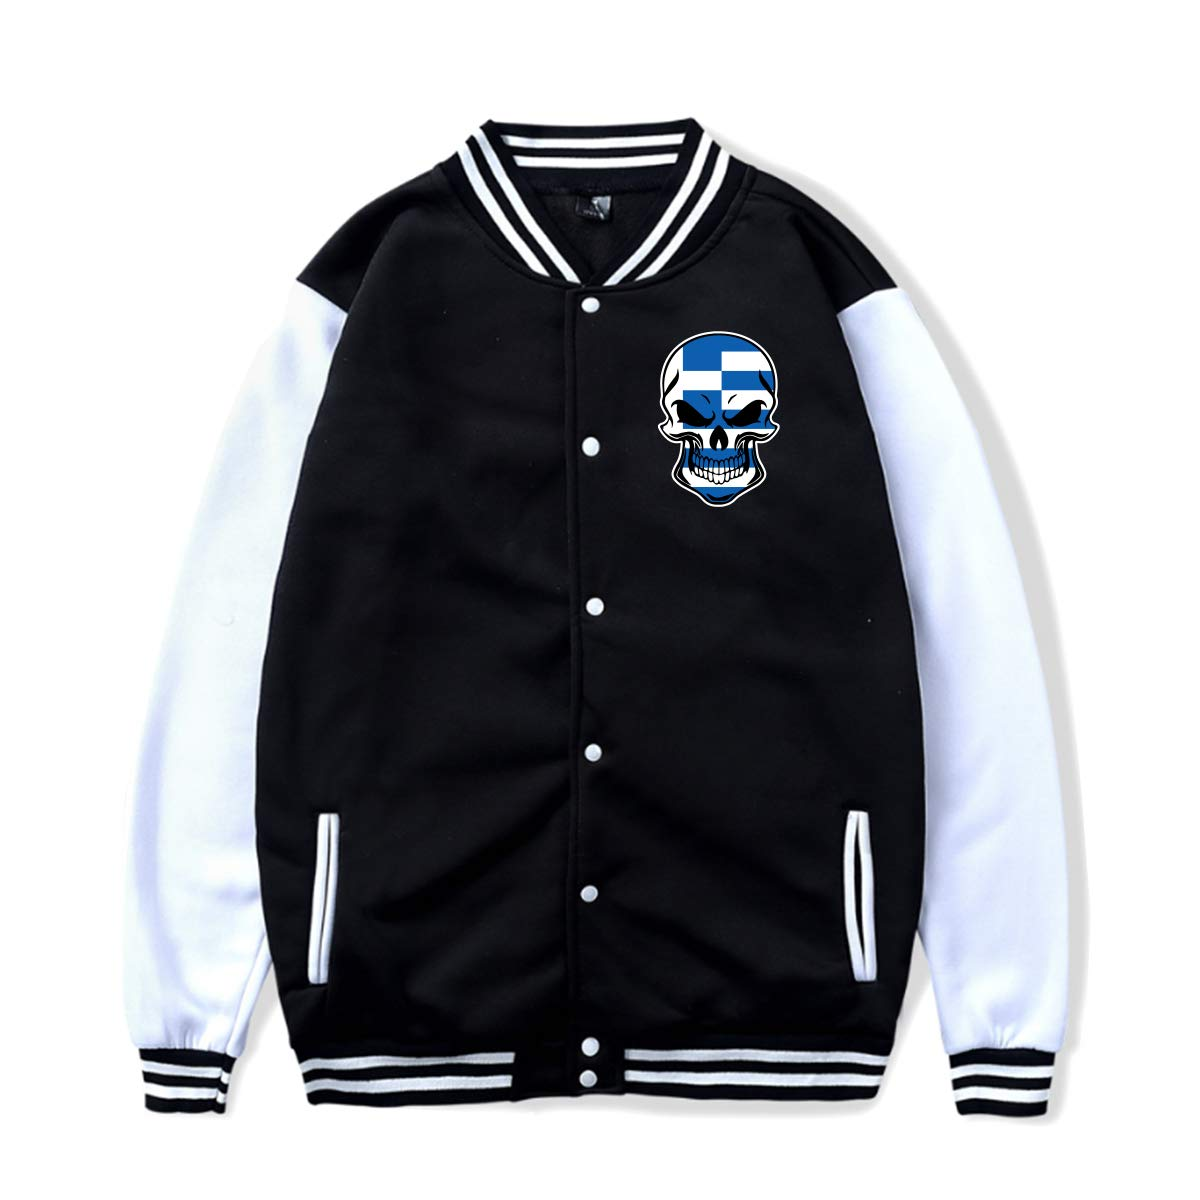 PLS/&A88 Unisex Baseball Jacket Uniform Greece Greek Flag Skull-1 Boys Girls Hoodie Sweatshirt Sweater Tee